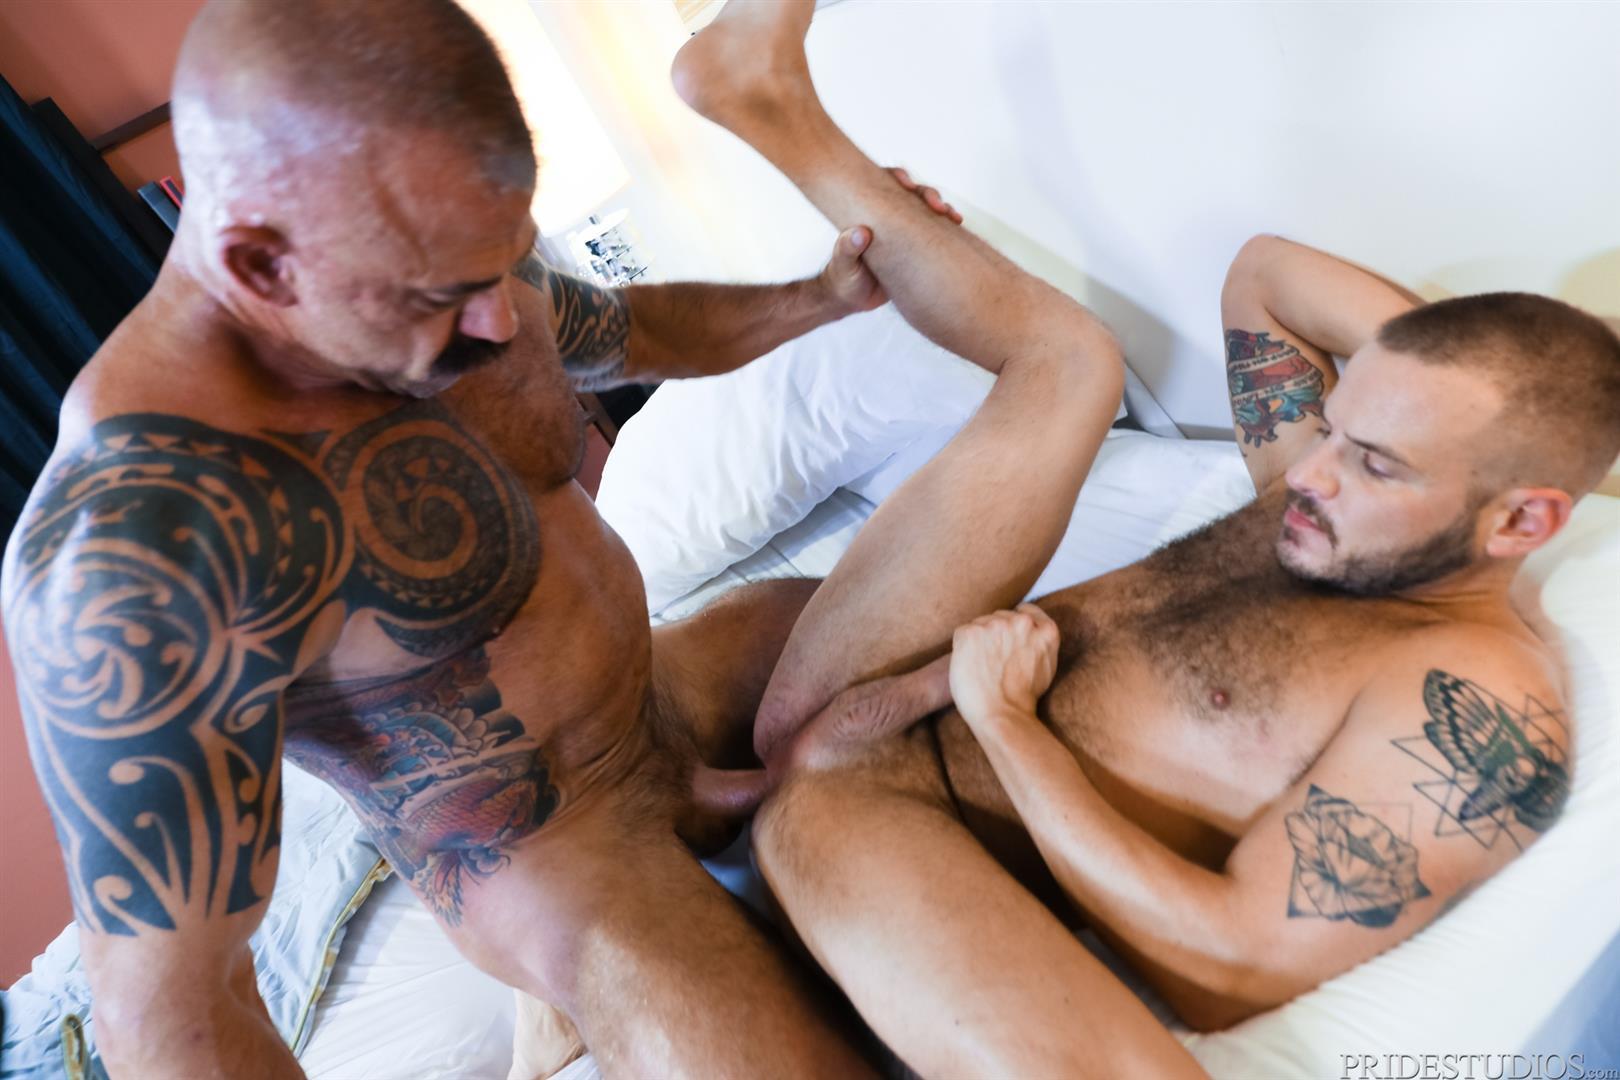 Men-Over-30-Jon-Galt-and-Sean-Harding-Muscle-Daddy-Barebacking-Muscle-Cub-14 Muscle Daddy Jon Galt And Muscle Cub Sean Harding Bareback Flipping